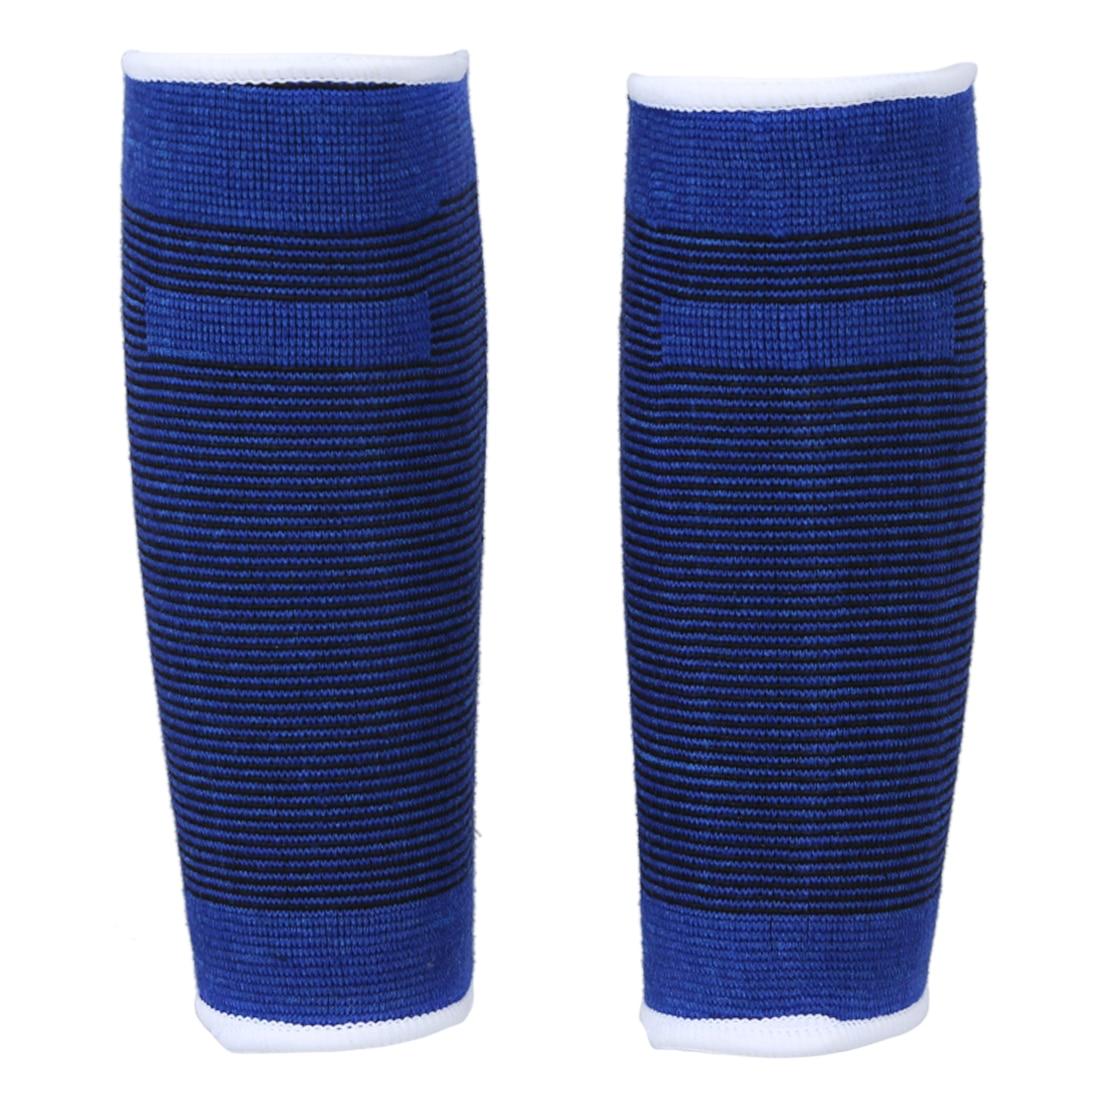 2 Pcs Sports Black Blue Striped Calf Leg Sleeves Support Elastic Protector